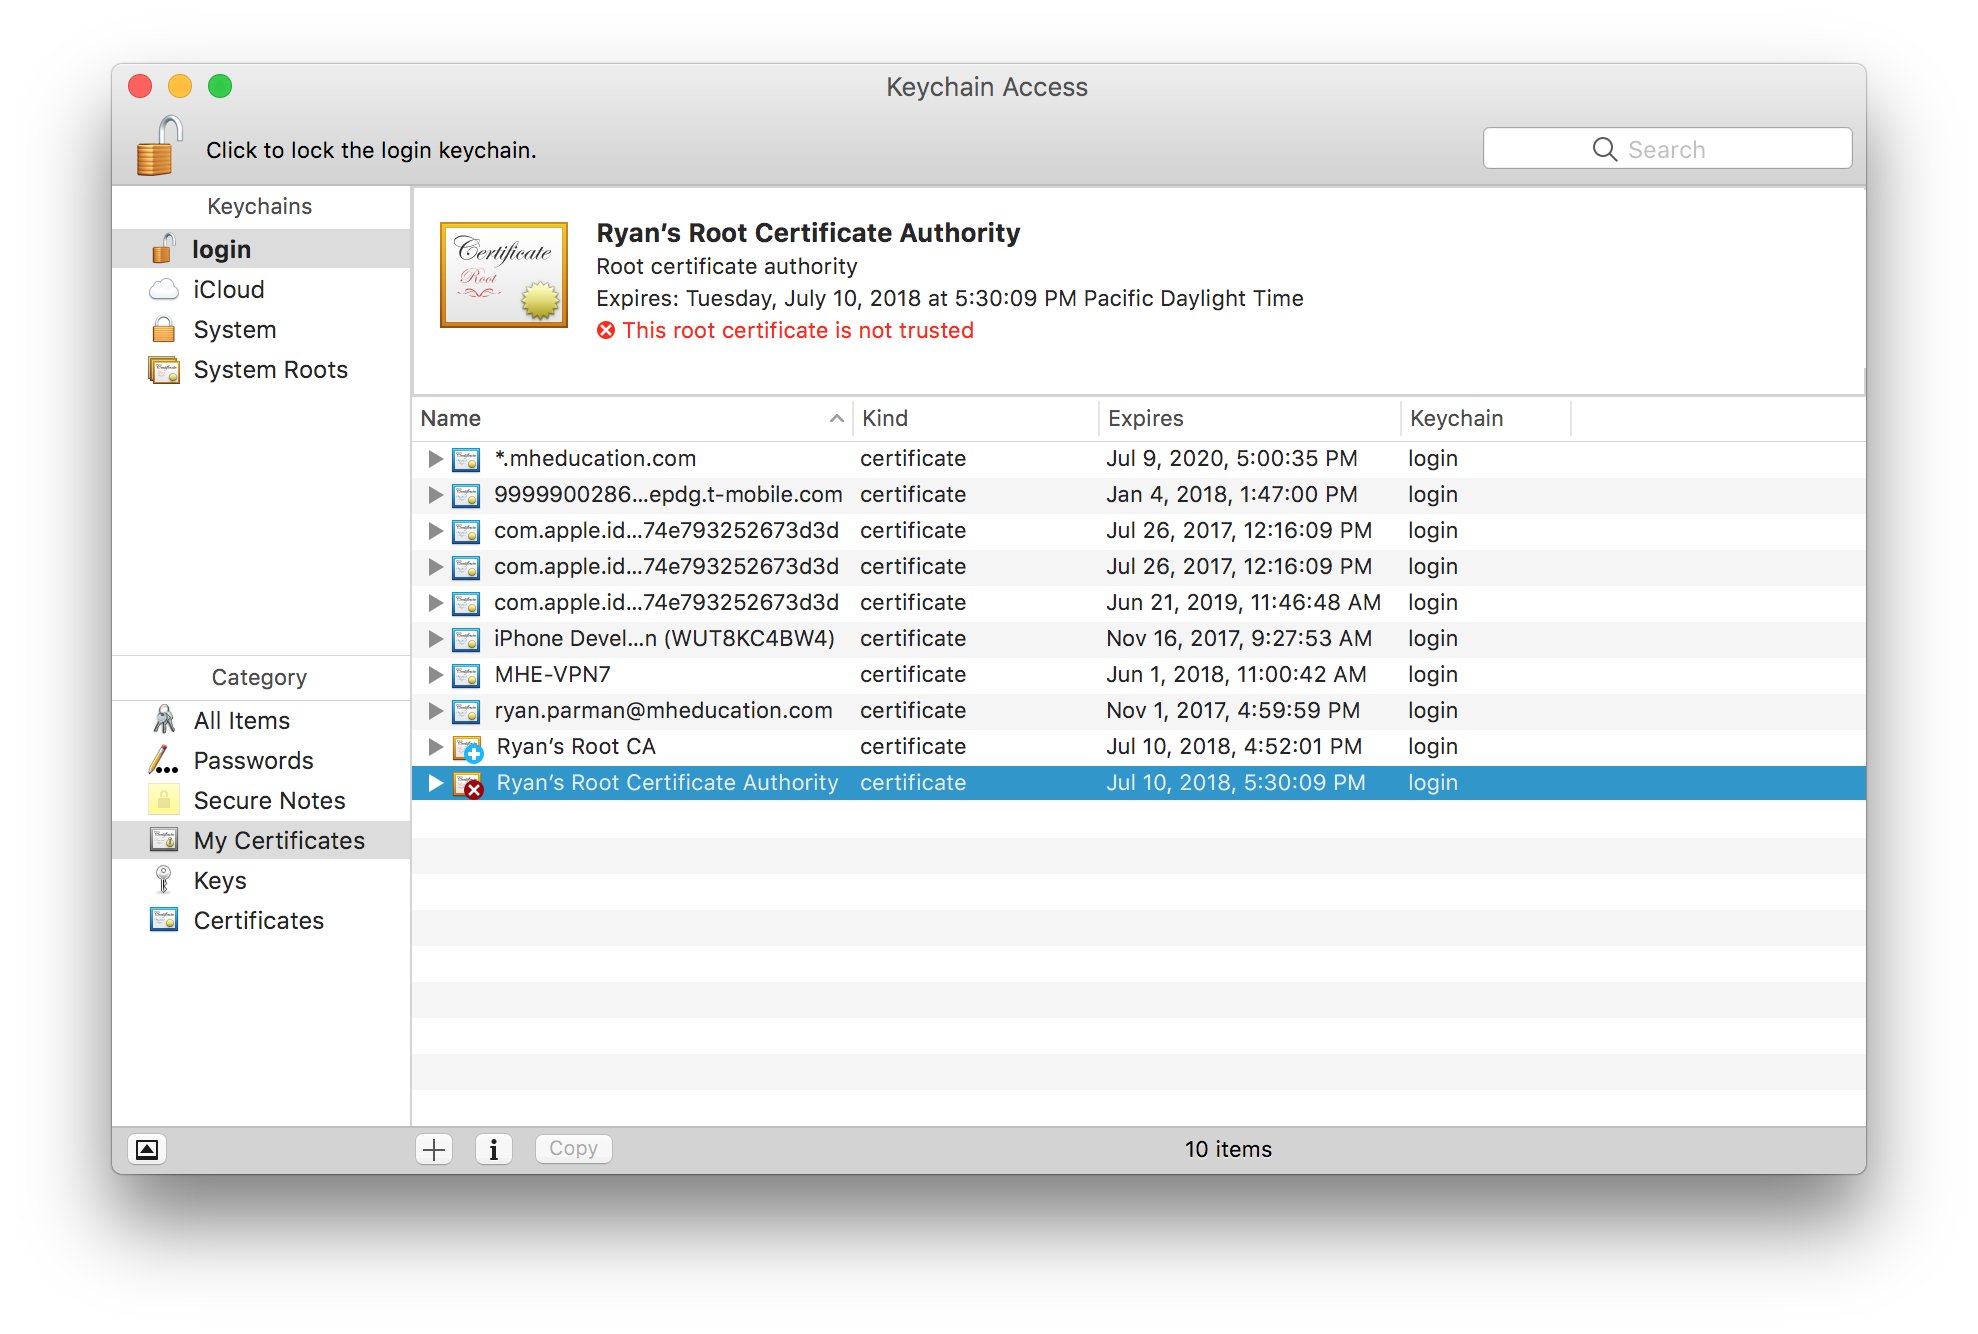 macOS Keychain Access